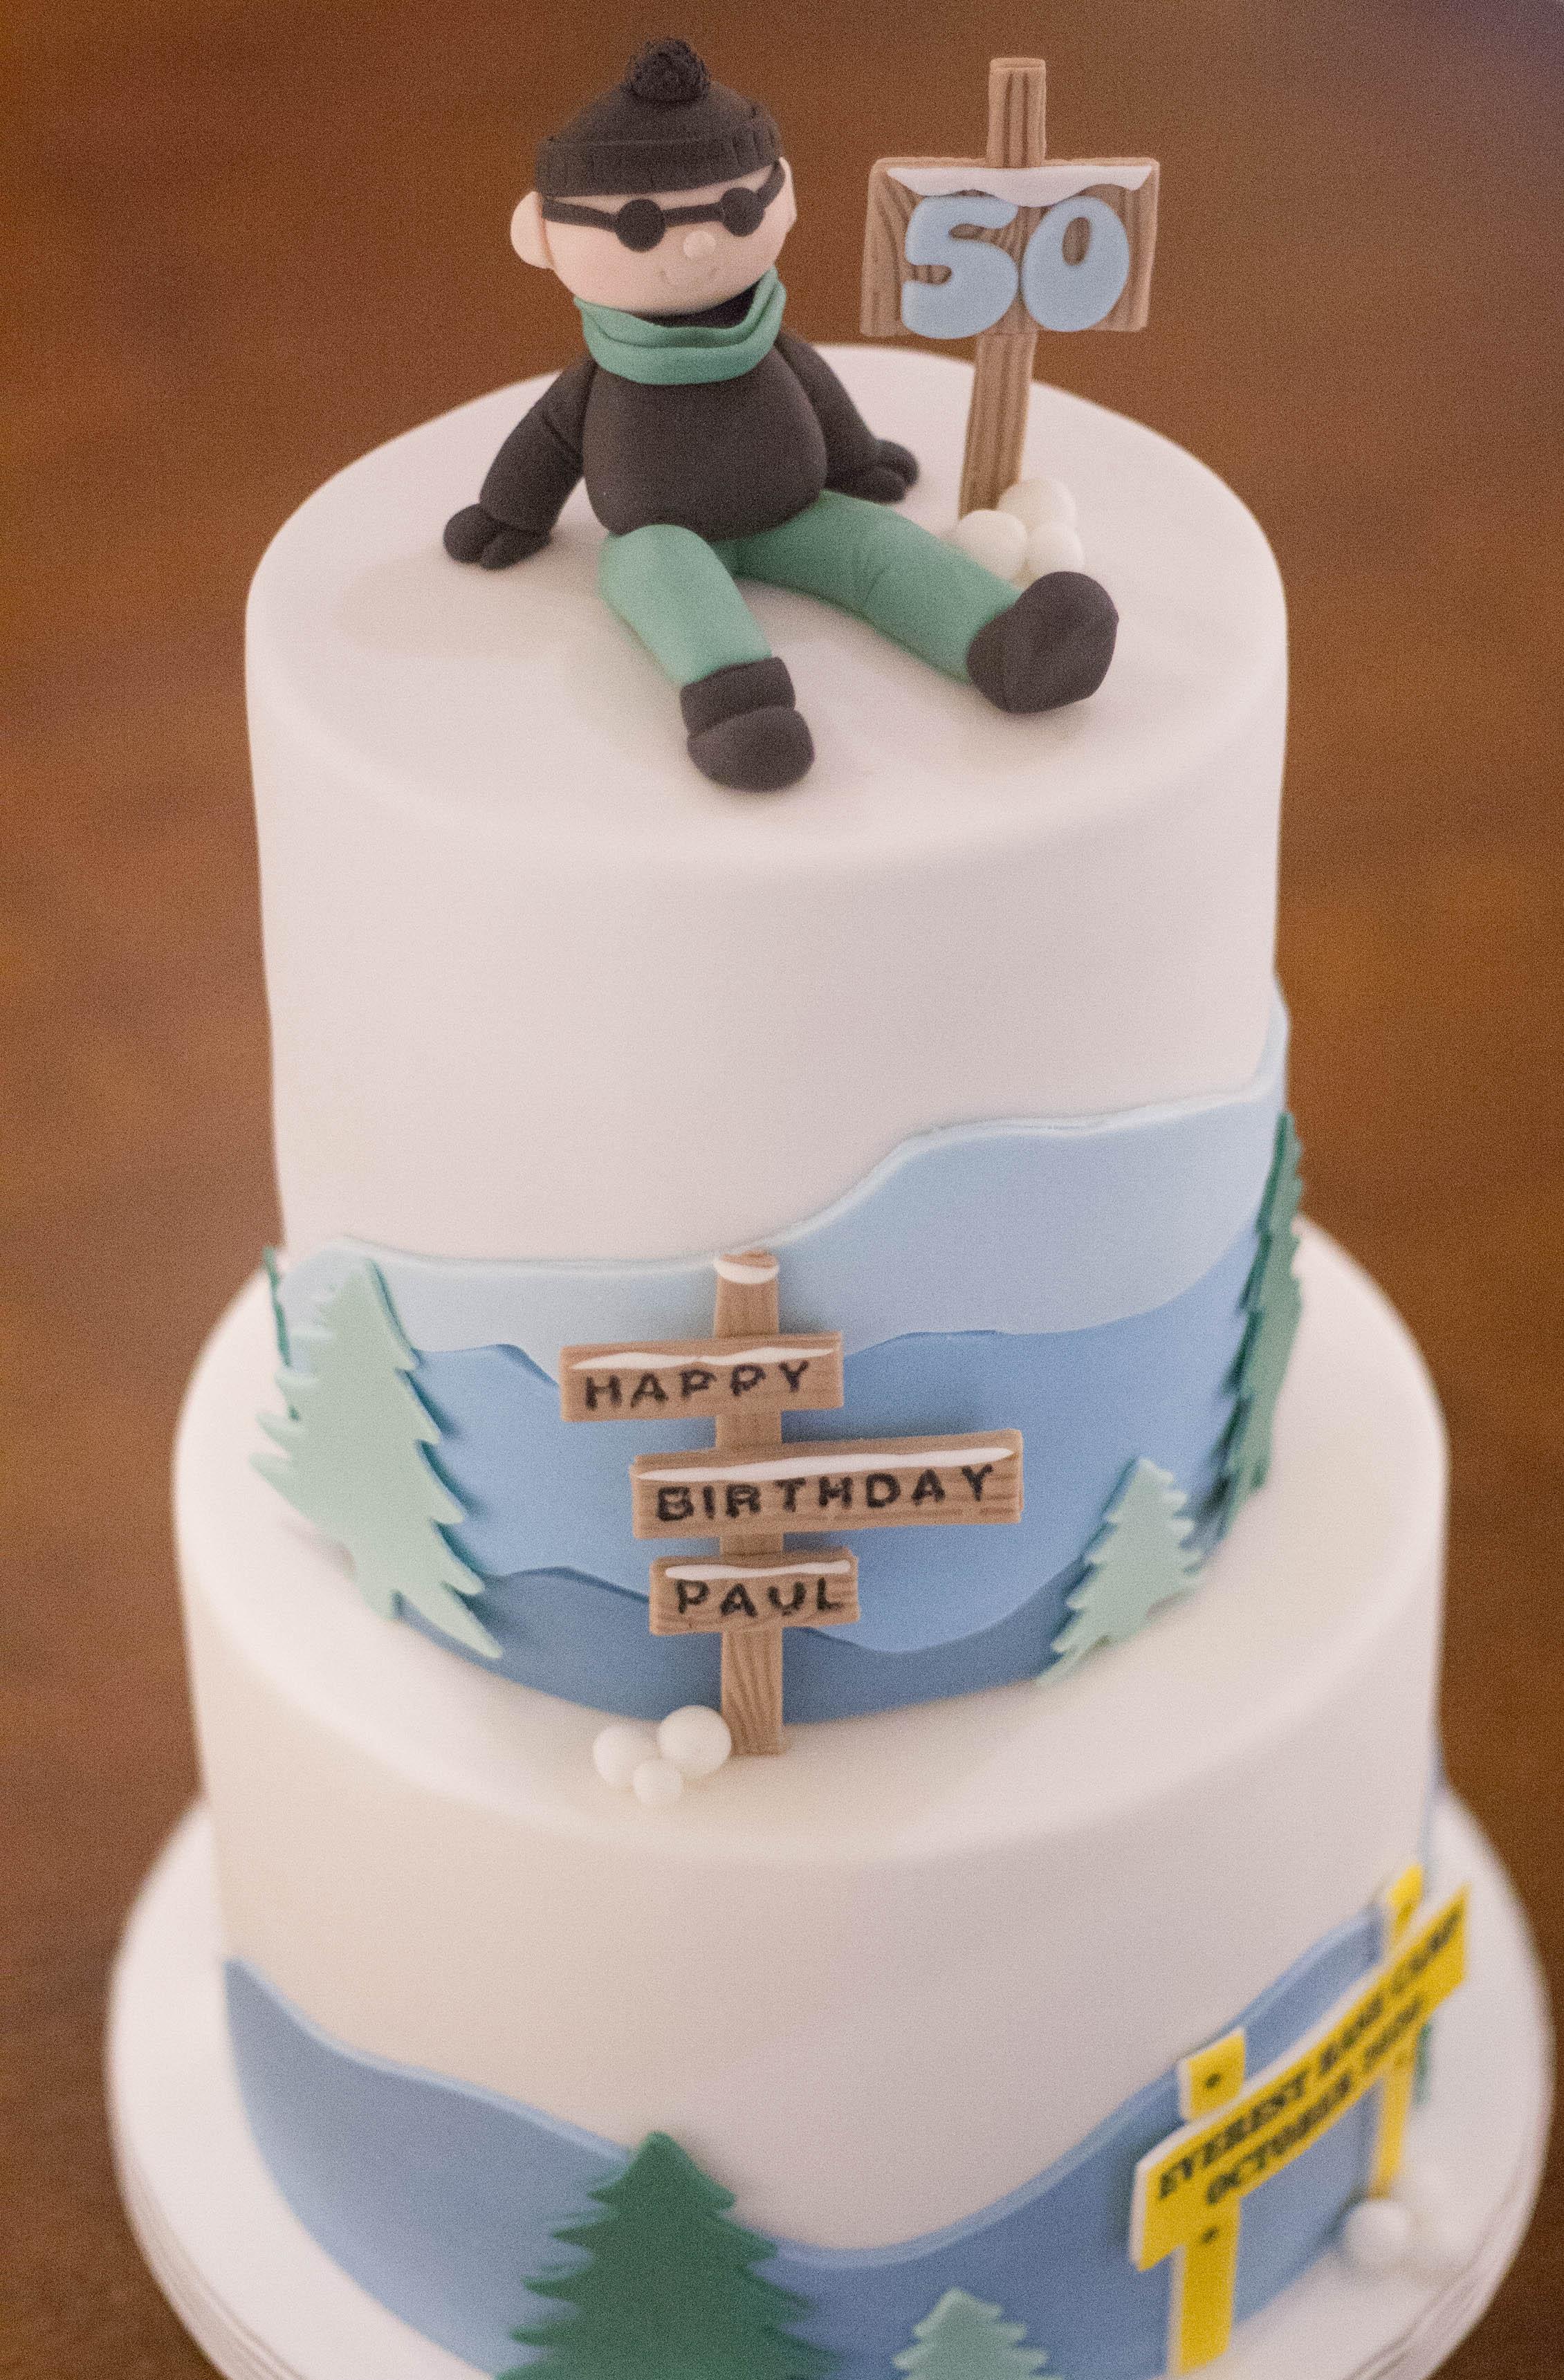 Everest vegan cake_